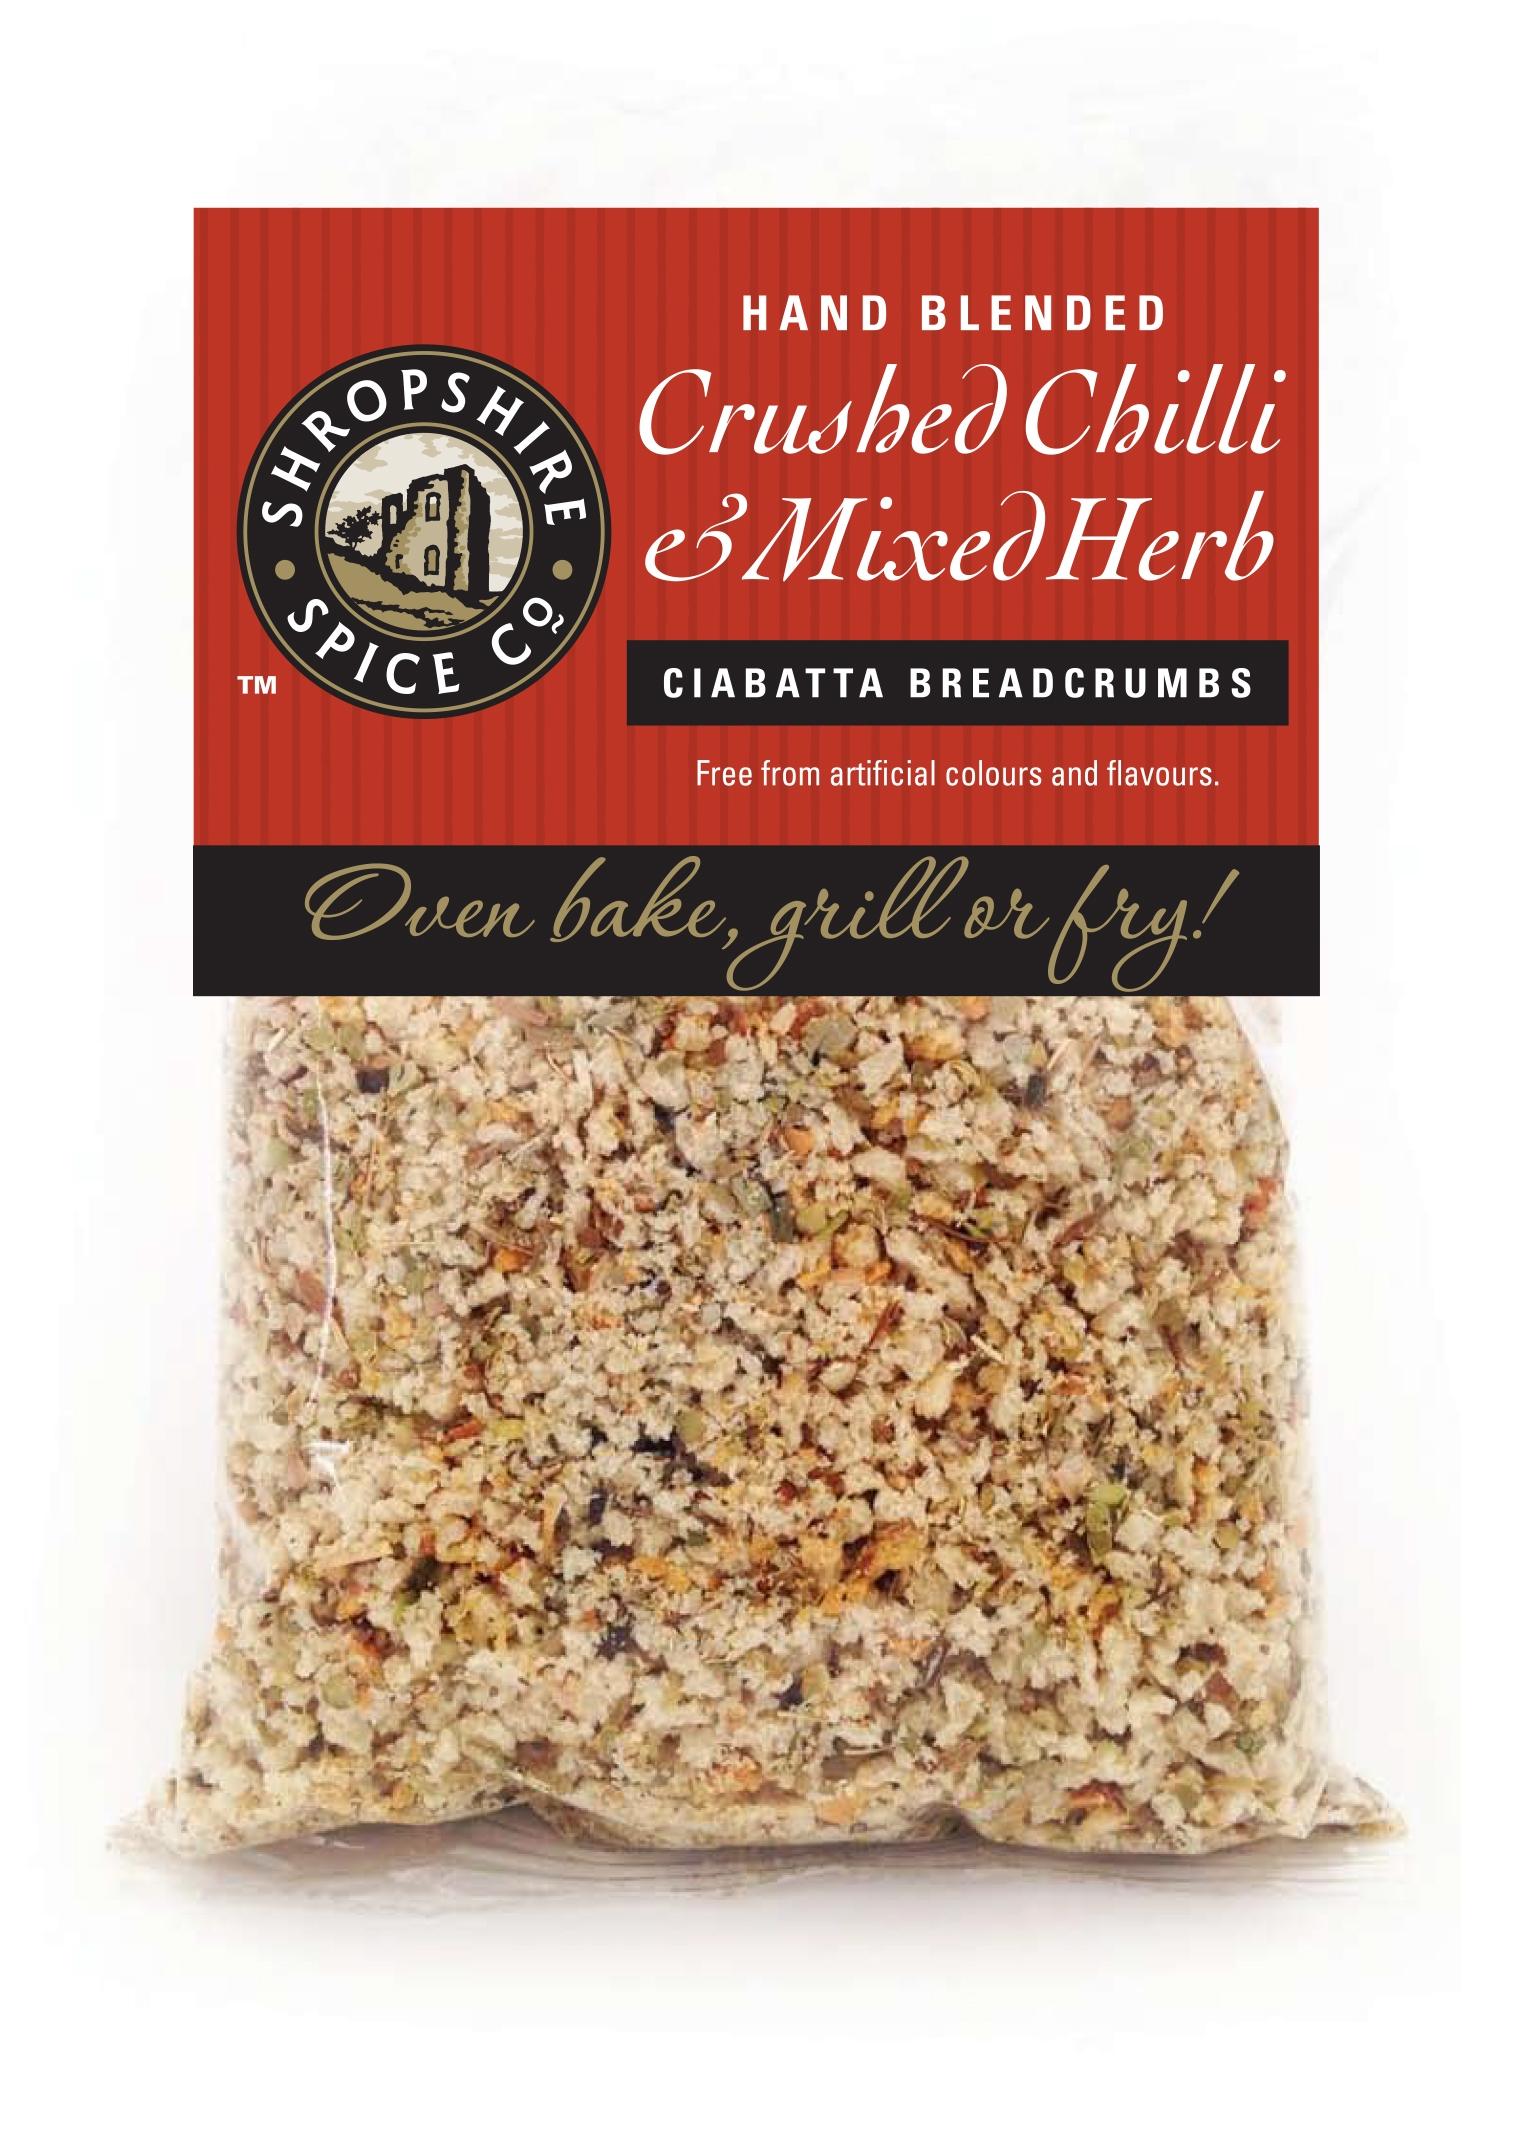 Crushed Chilli & Mixed Herb Ciabatta Breadcrumbs